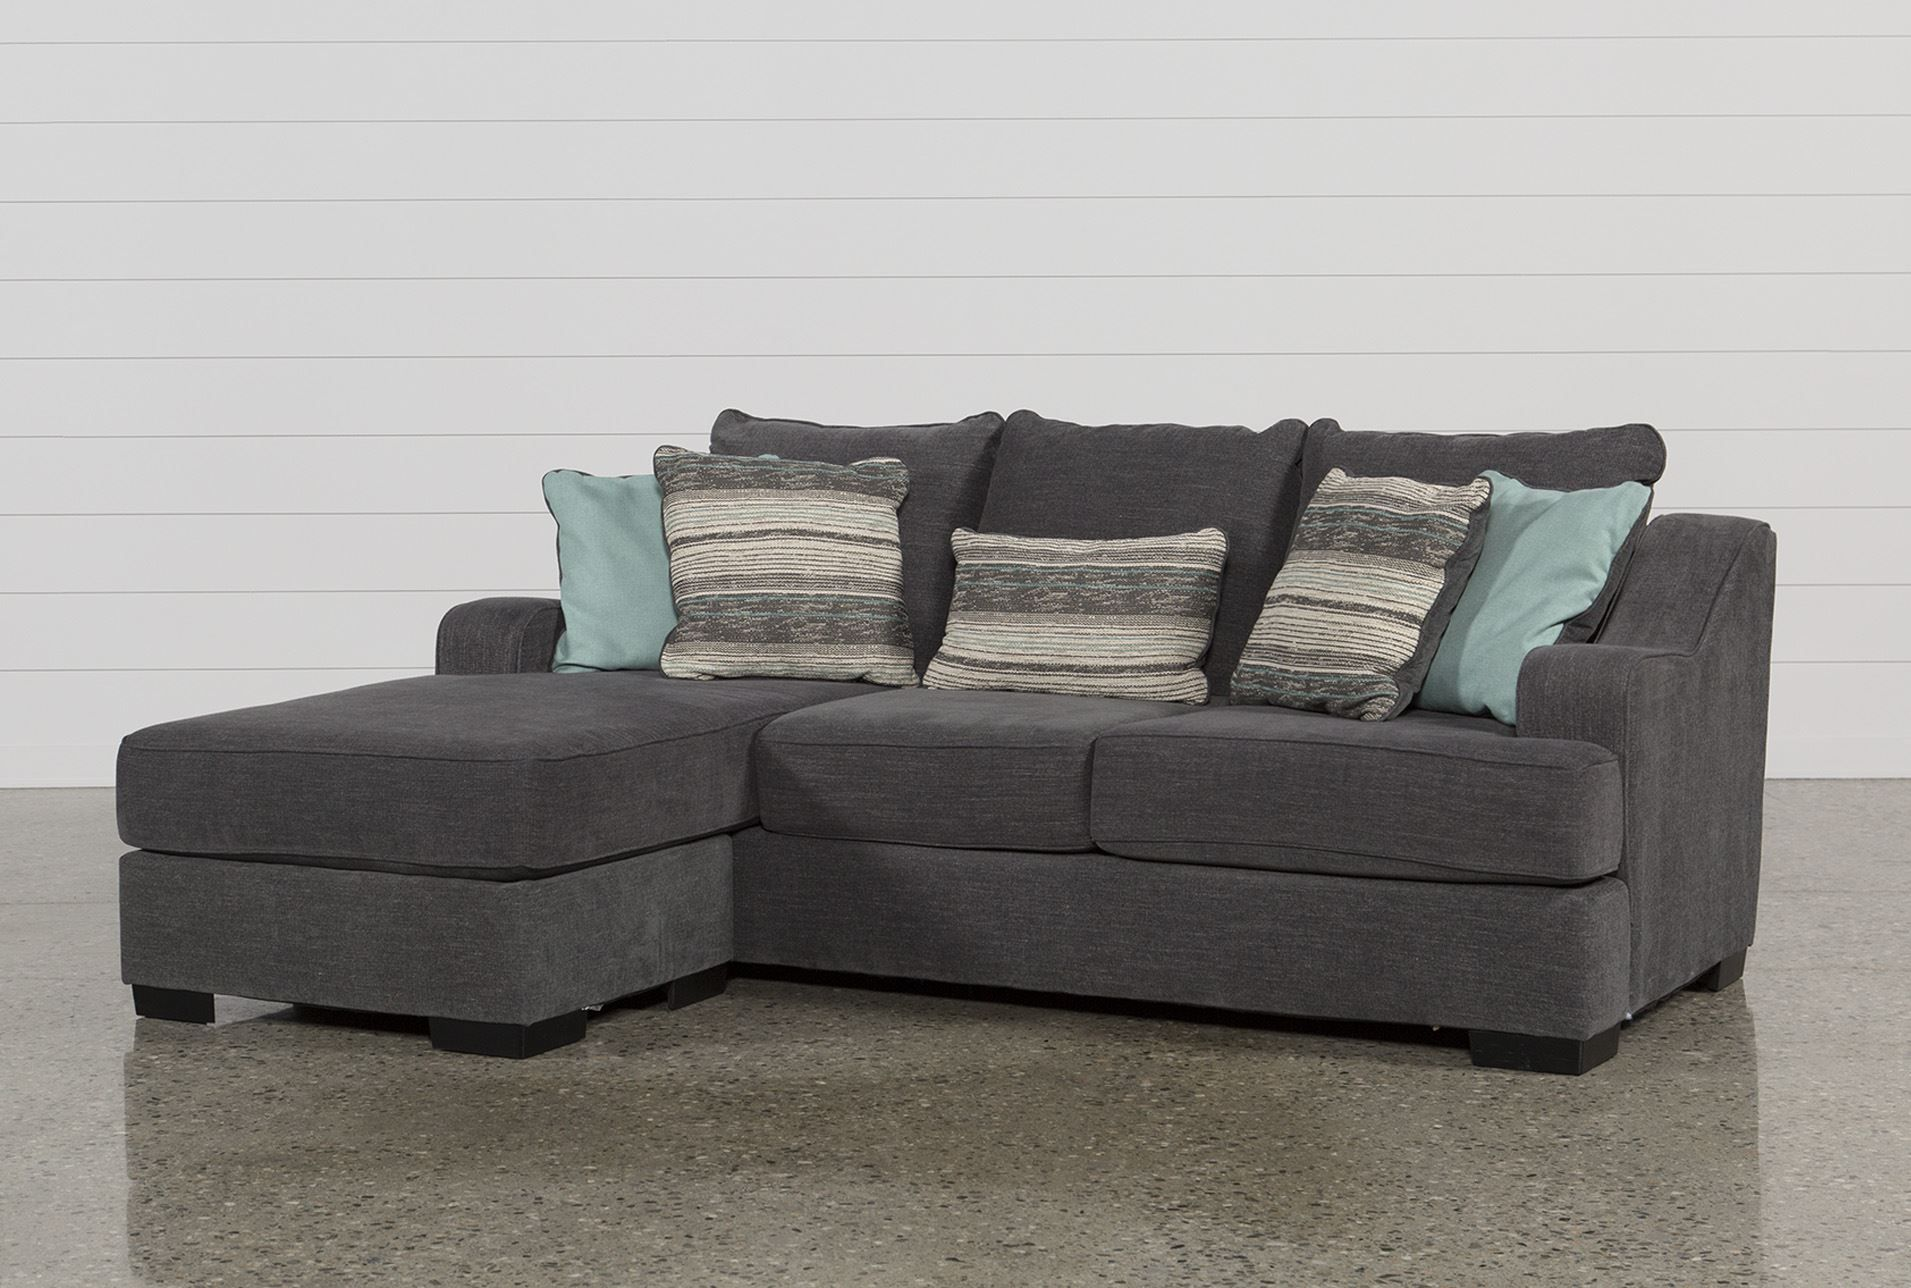 Astounding Nice Fresh Sofas Sectionals 72 On Hme Designing Inspiration Lamtechconsult Wood Chair Design Ideas Lamtechconsultcom